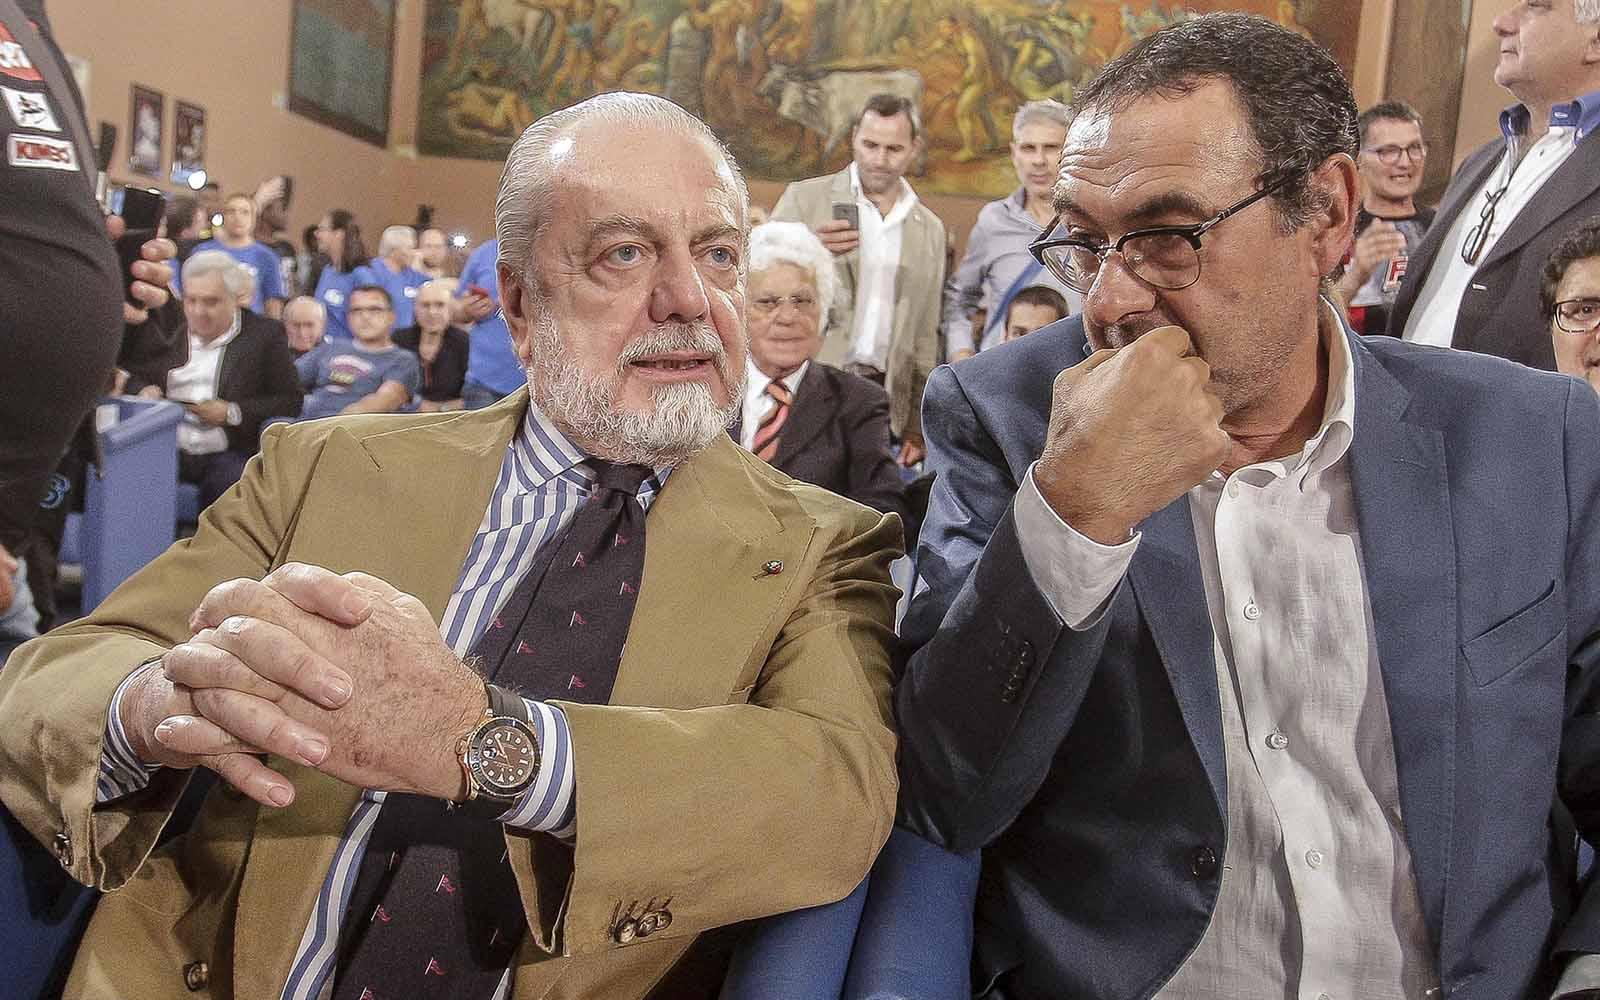 Calcio Mercato: stretta Sarri-Chelsea, manca solo l'ok di De Laurentiis